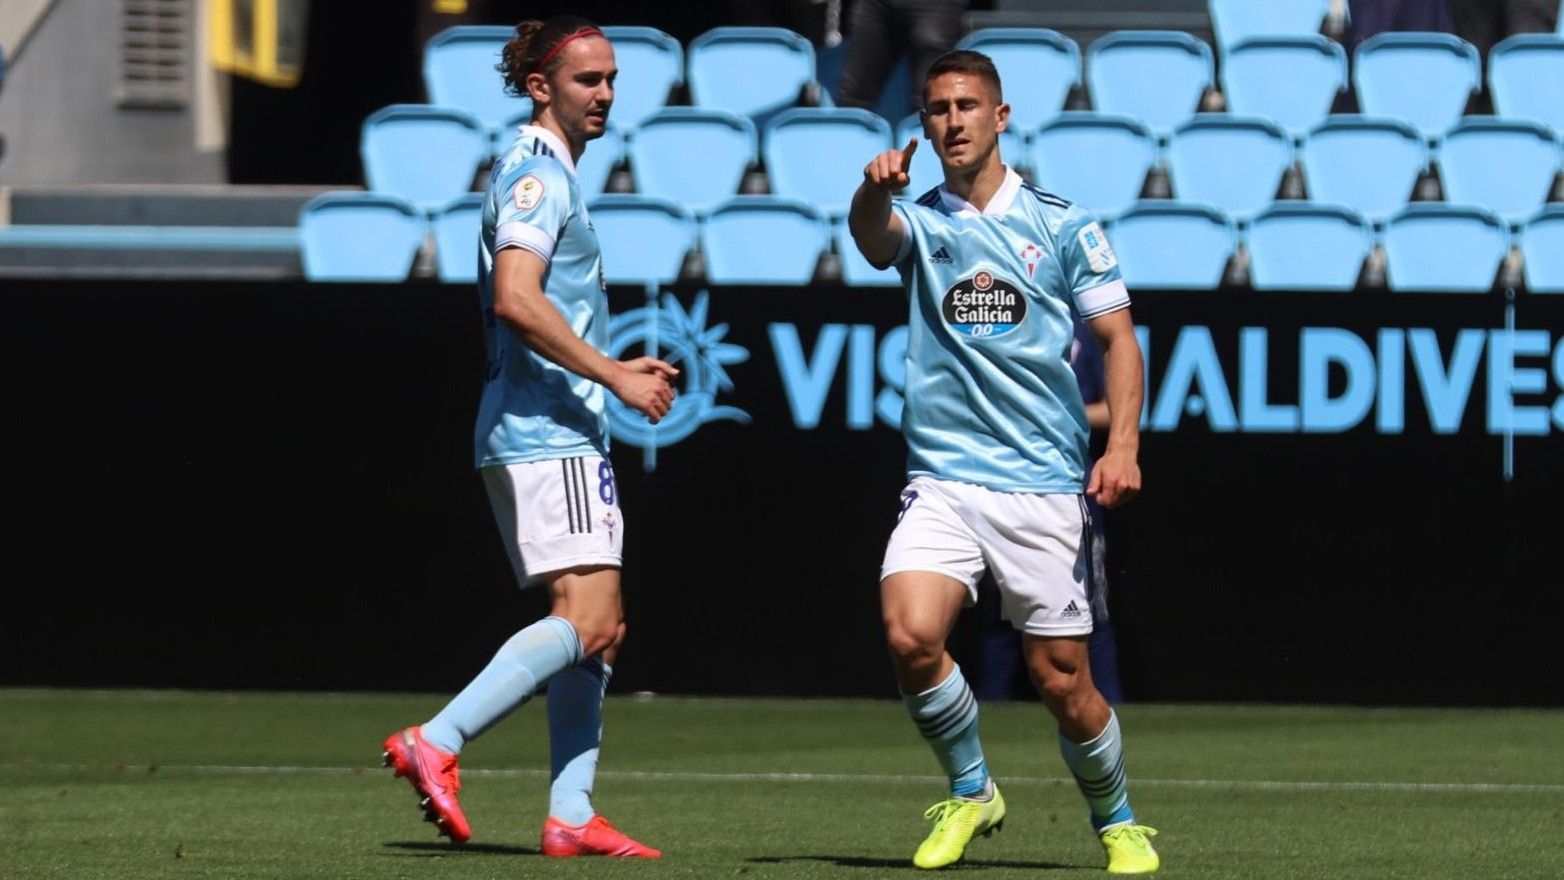 Manu Justo celebra un gol con el filial celtiña